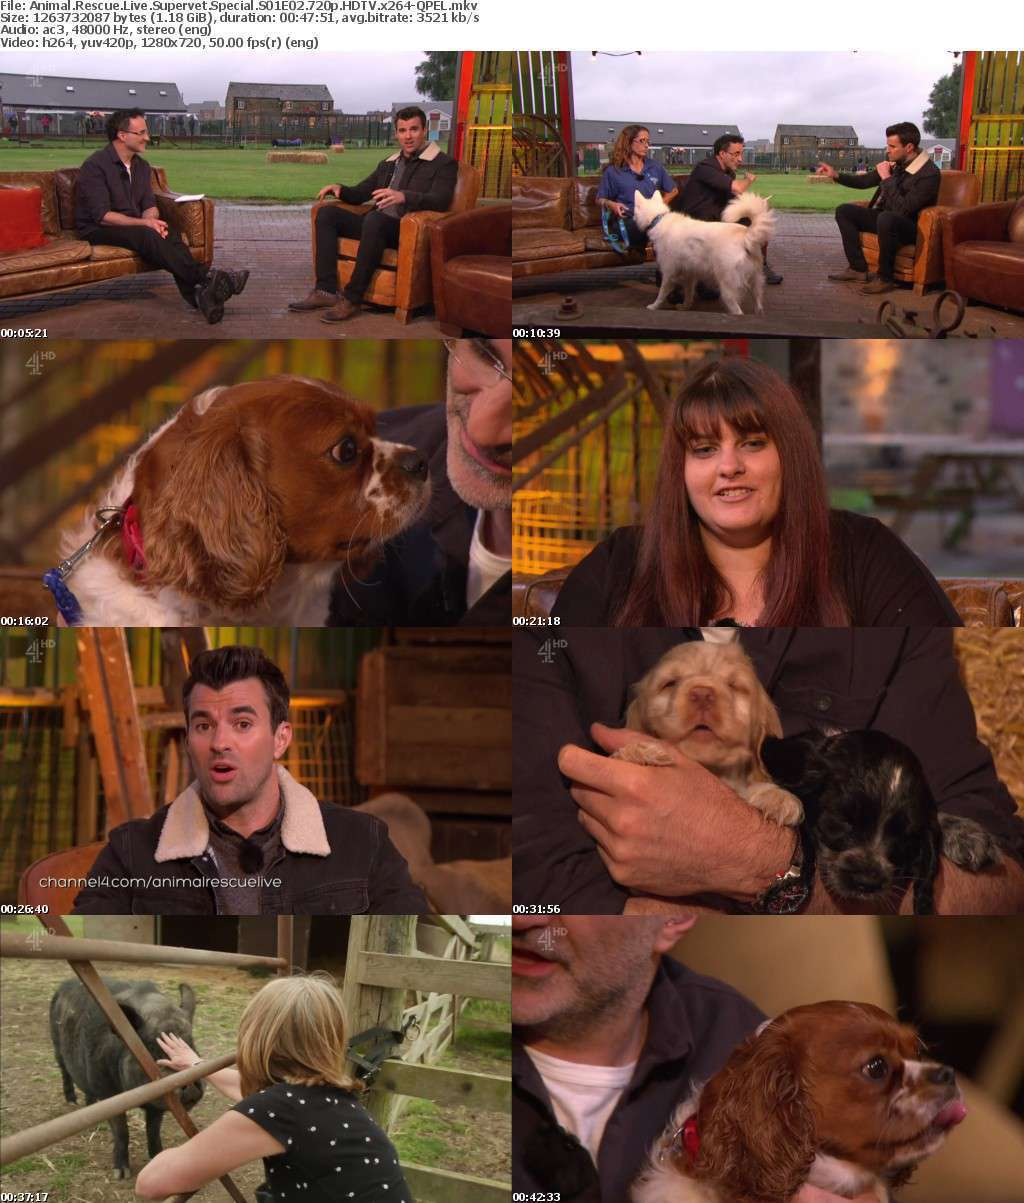 Animal Rescue Live Supervet Special S01E02 720p HDTV x264-QPEL